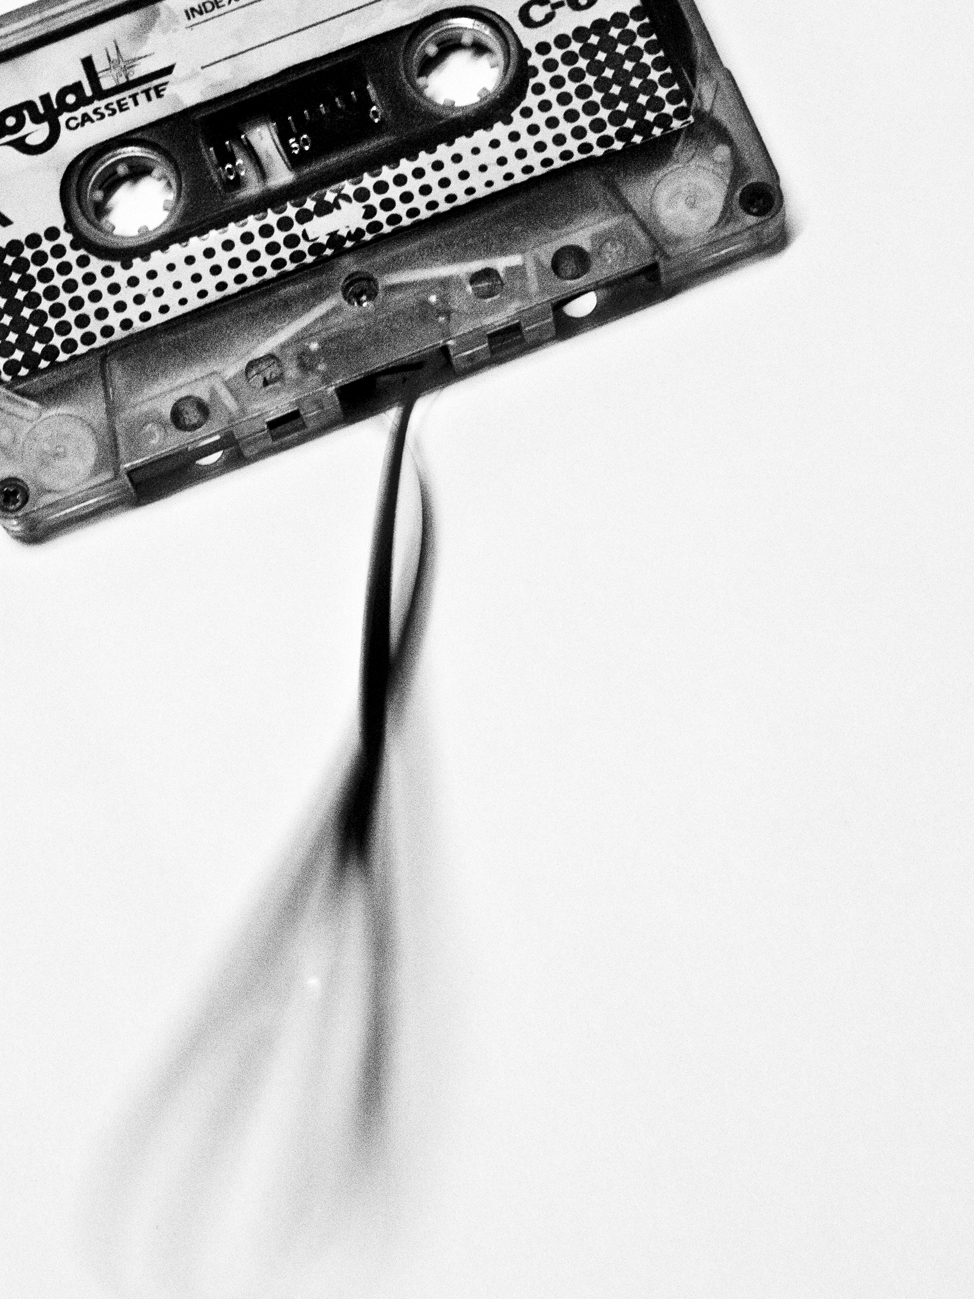 Cassette, Rhythm Alive